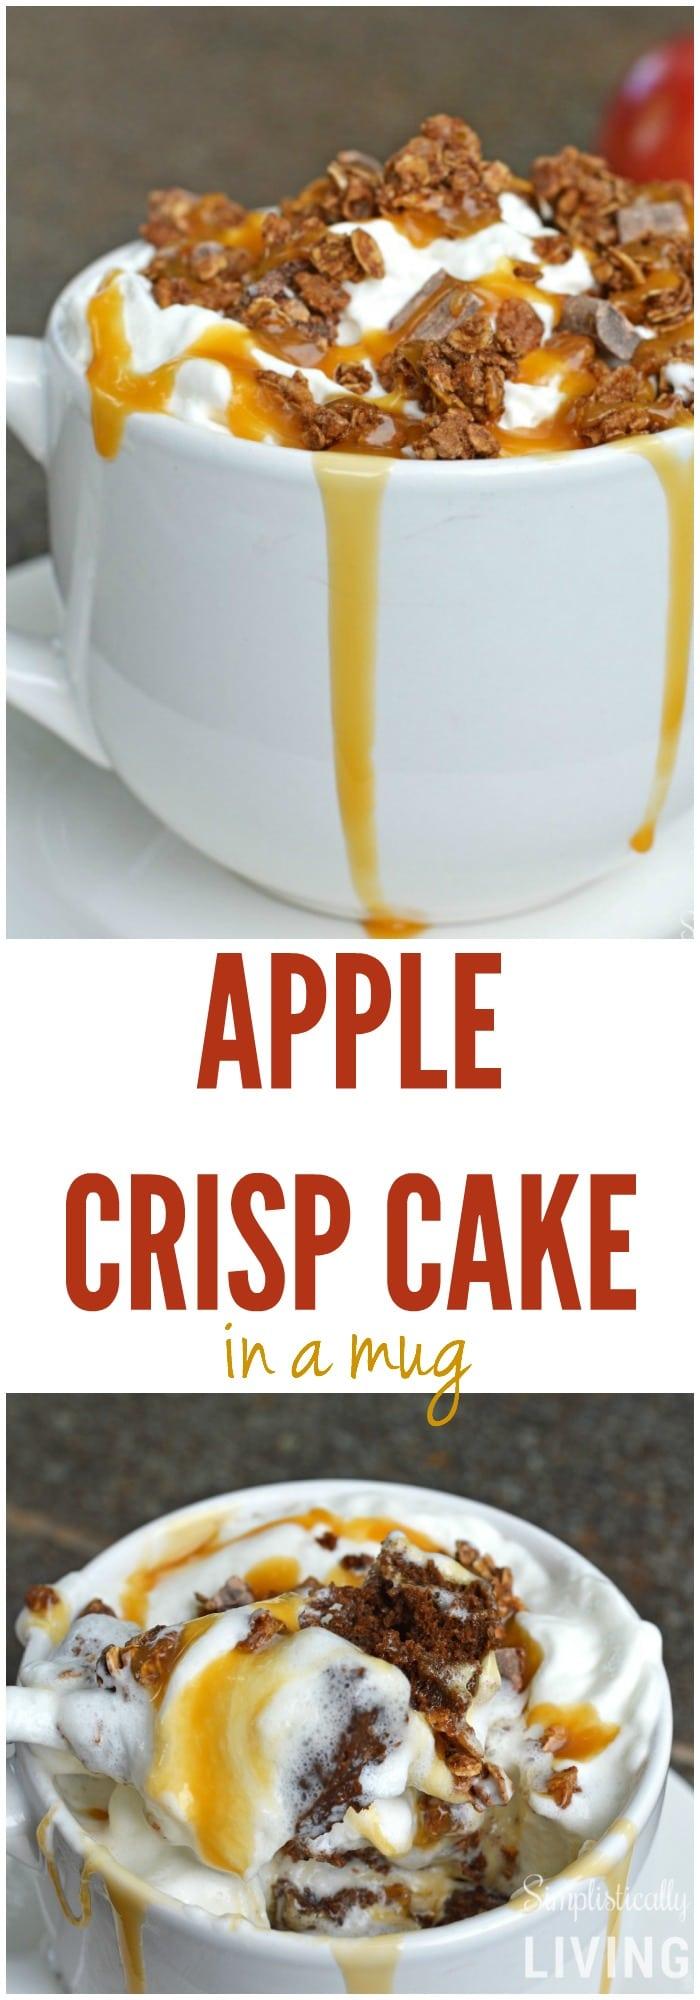 Apple Crisp Cake in a Mug